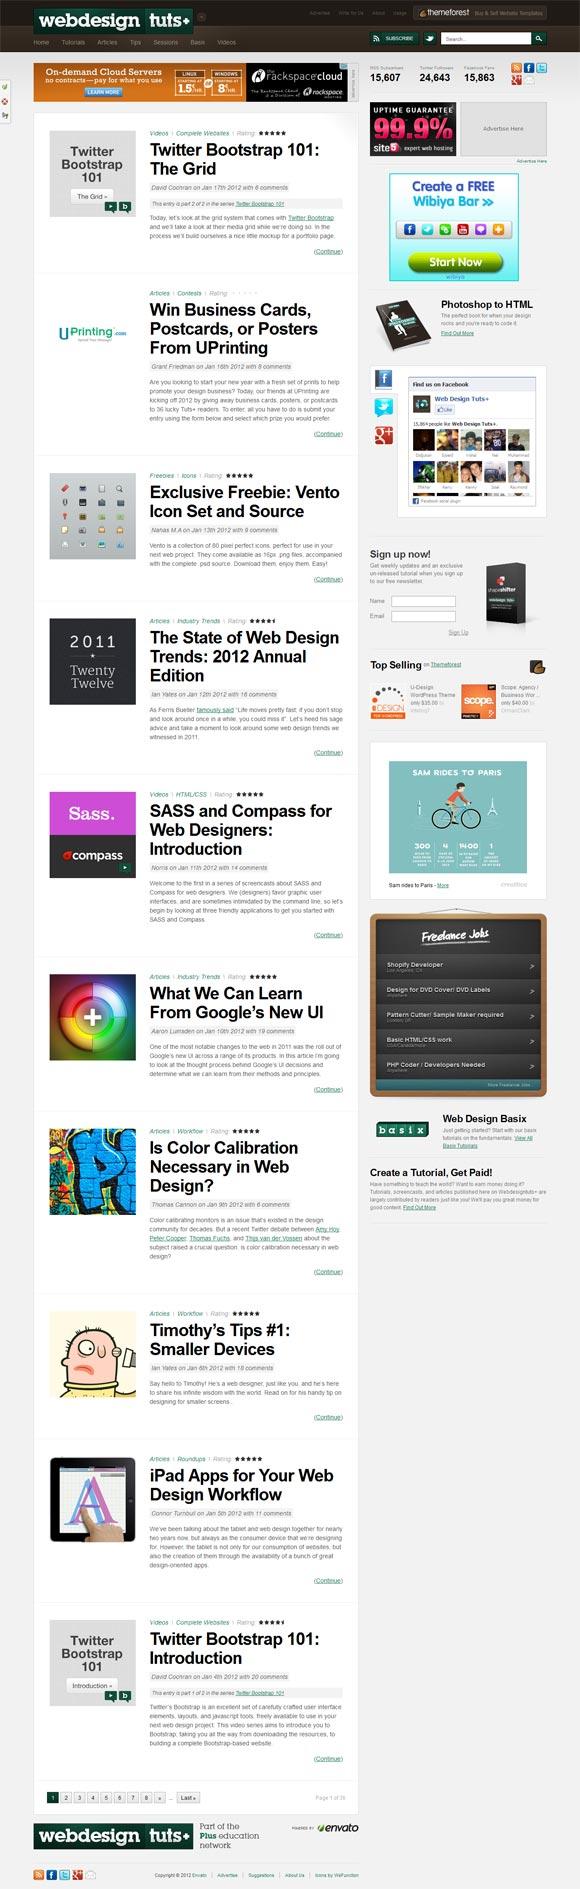 Webdesigntuts+